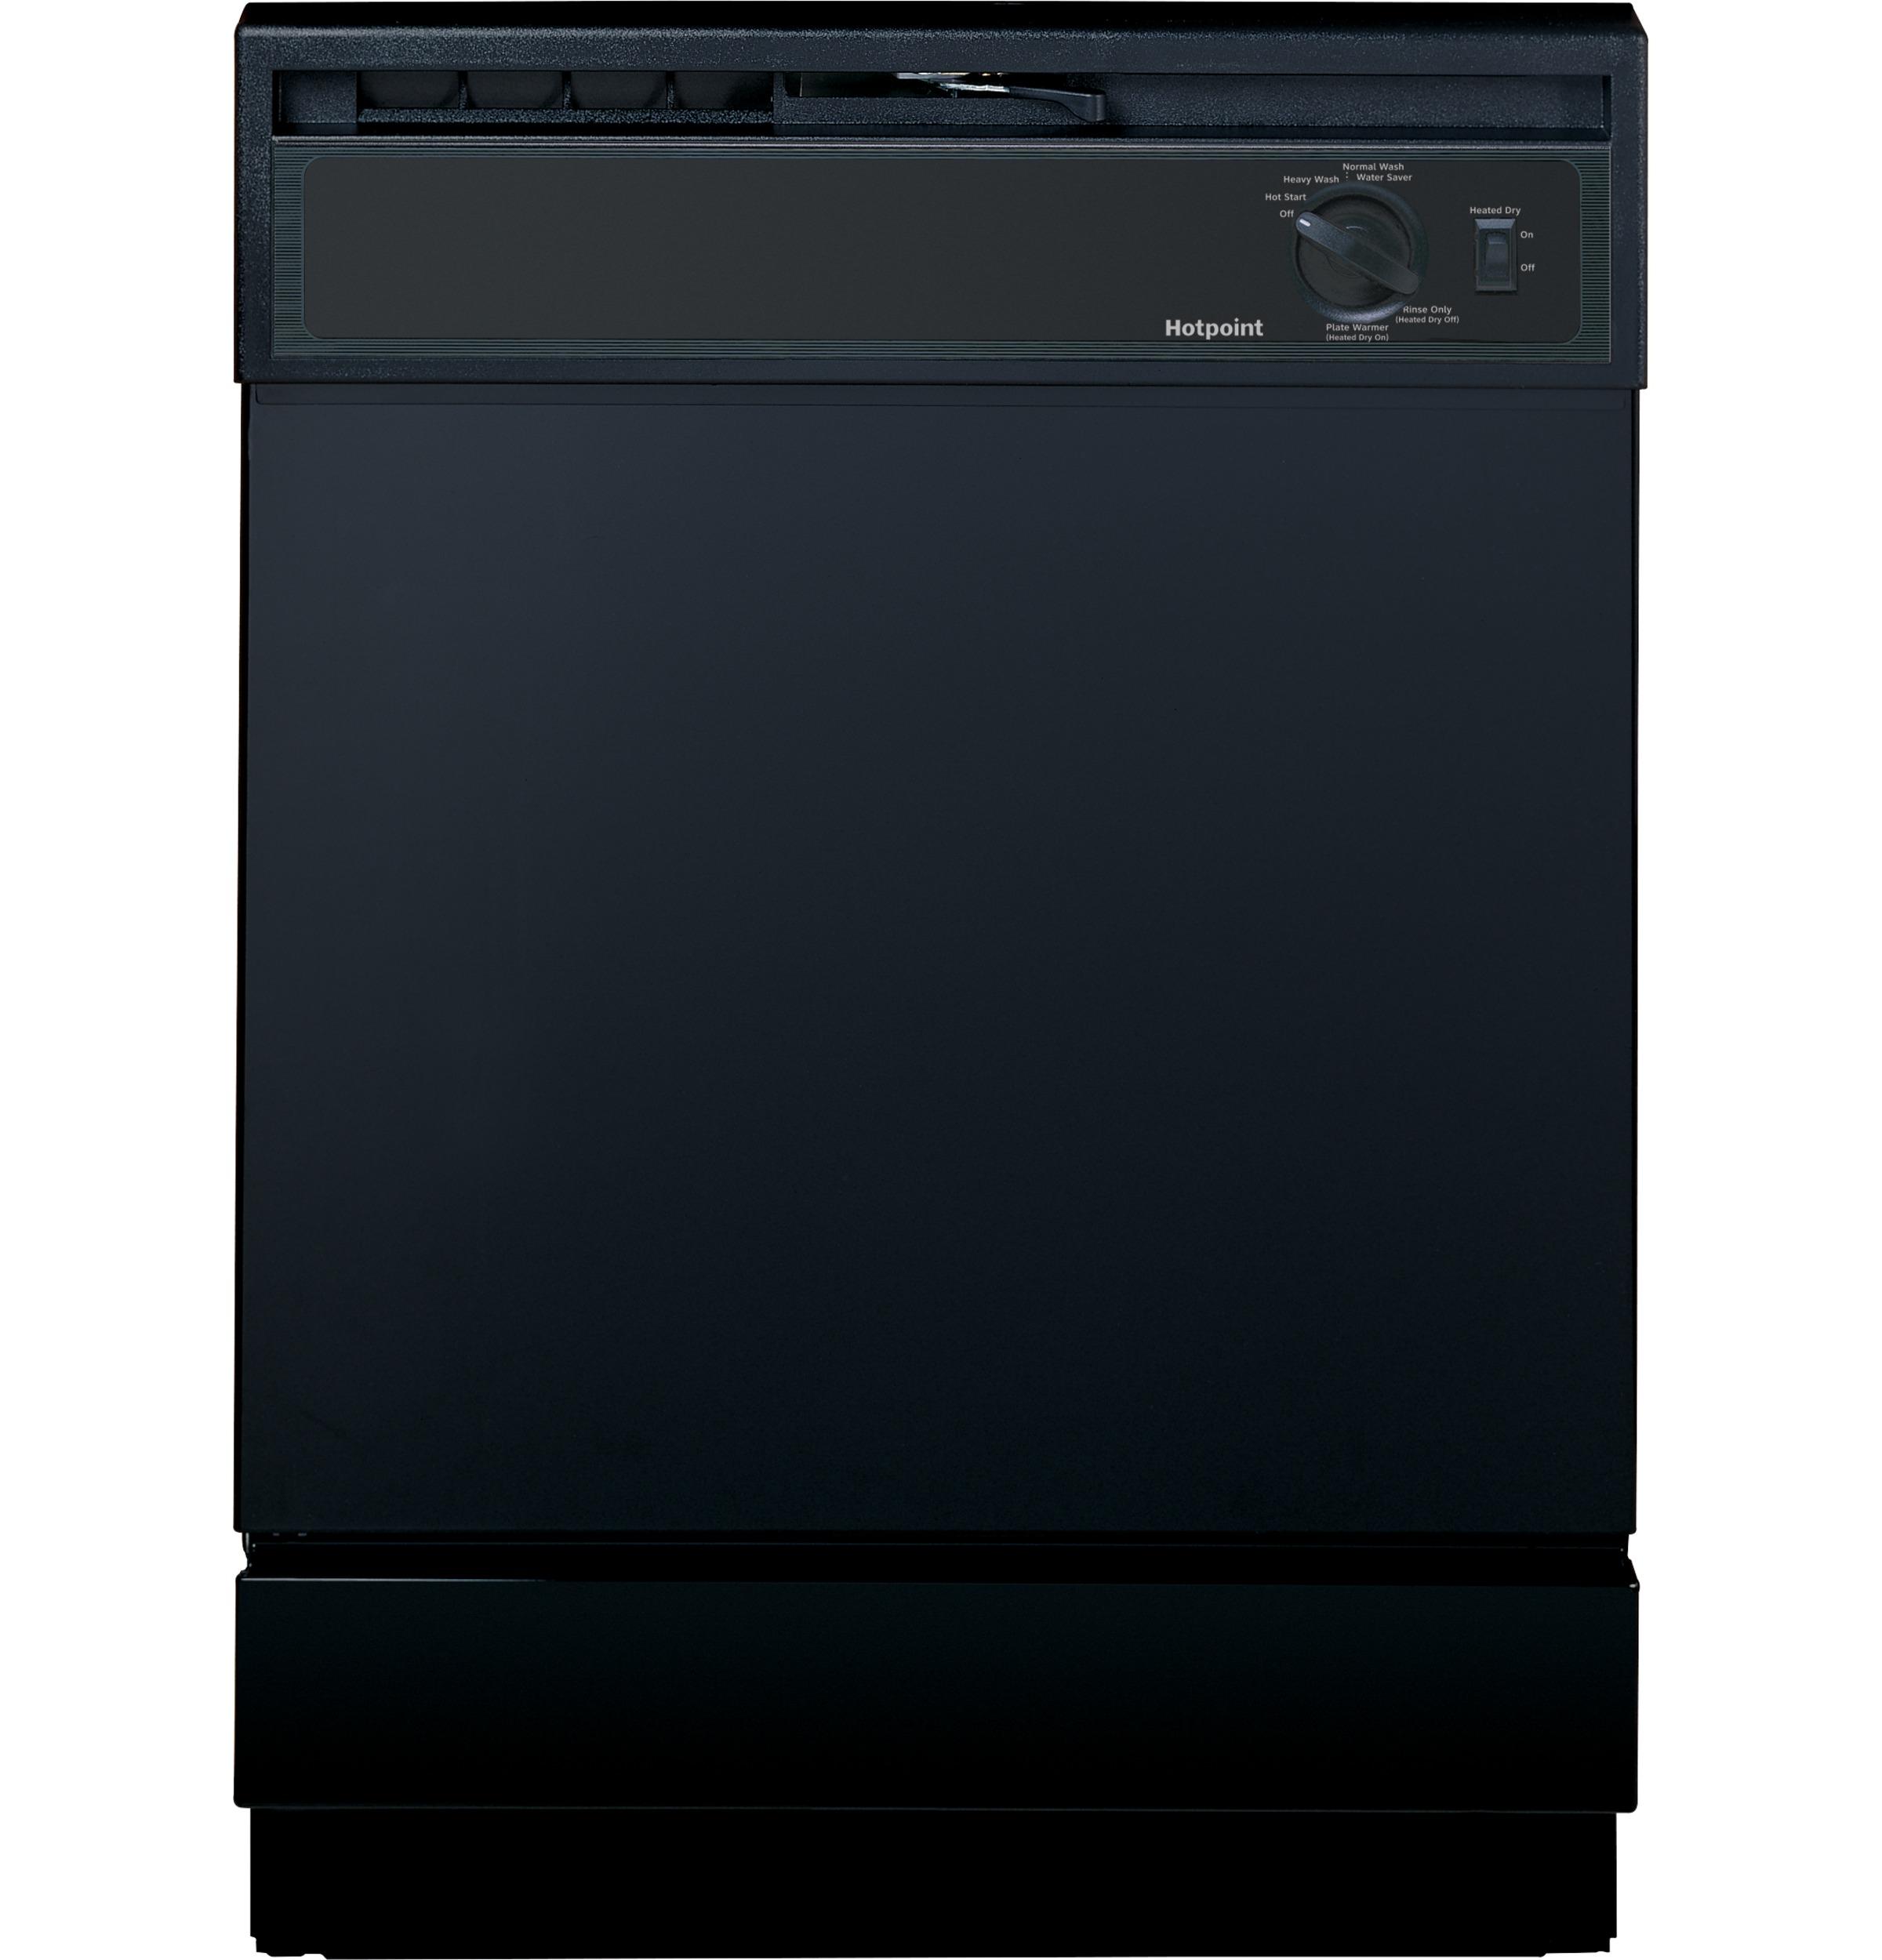 Model: HDA2100HBB | Hotpoint® Built-In Dishwasher